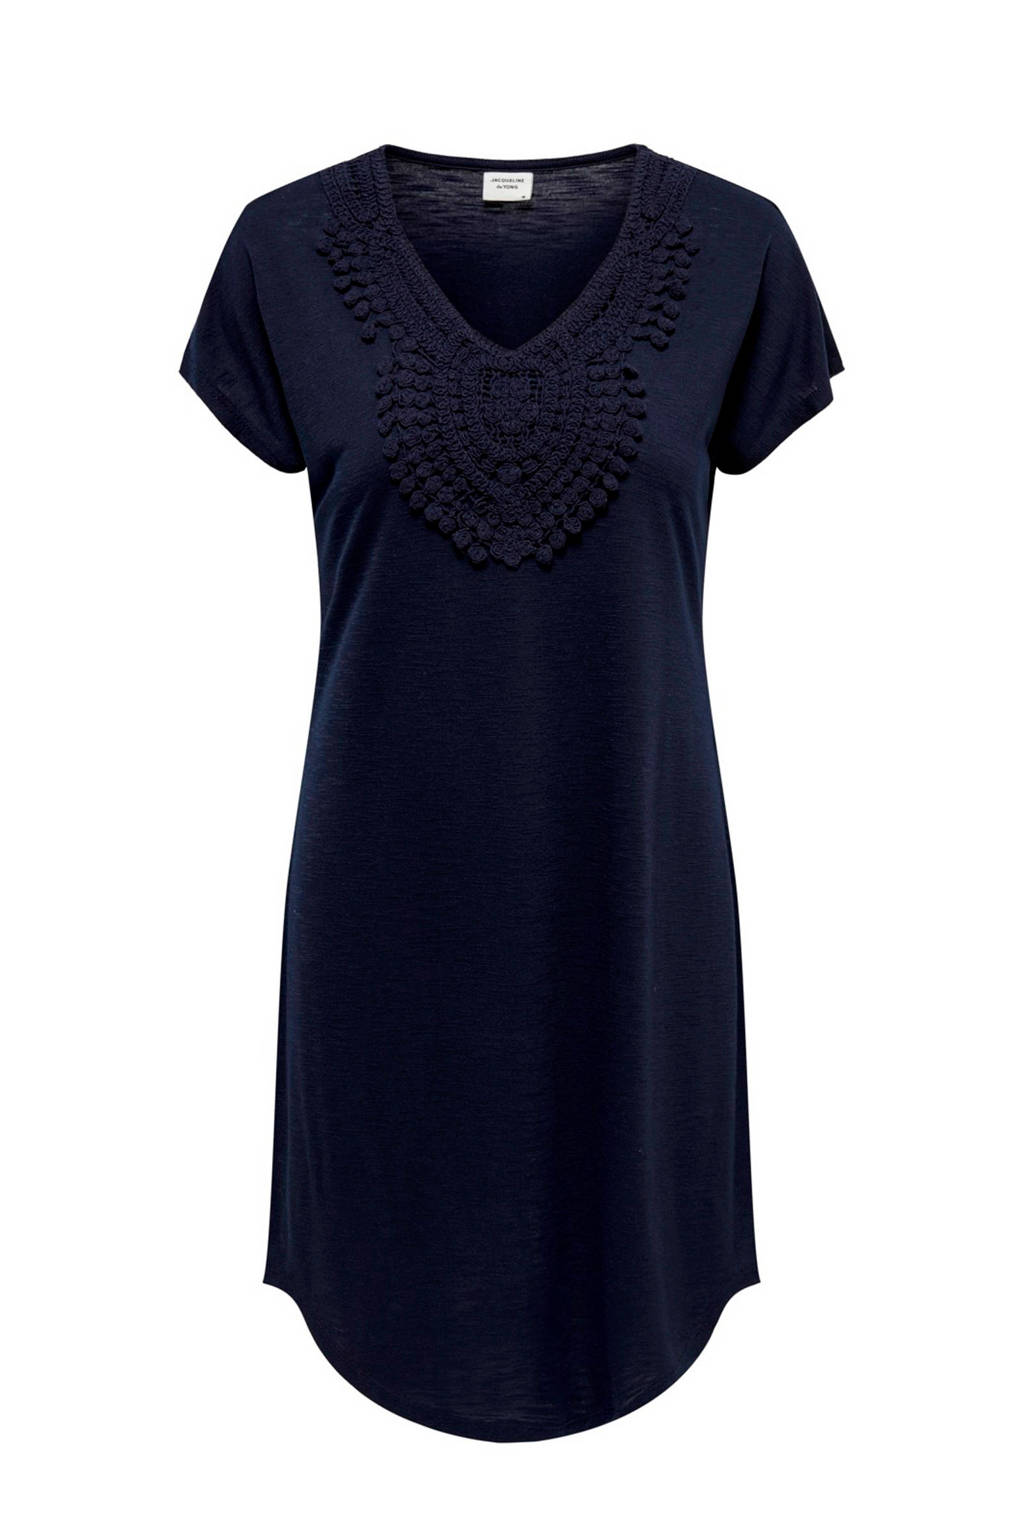 JACQUELINE DE YONG jurk met borduursels donkerblauw, Donkerblauw